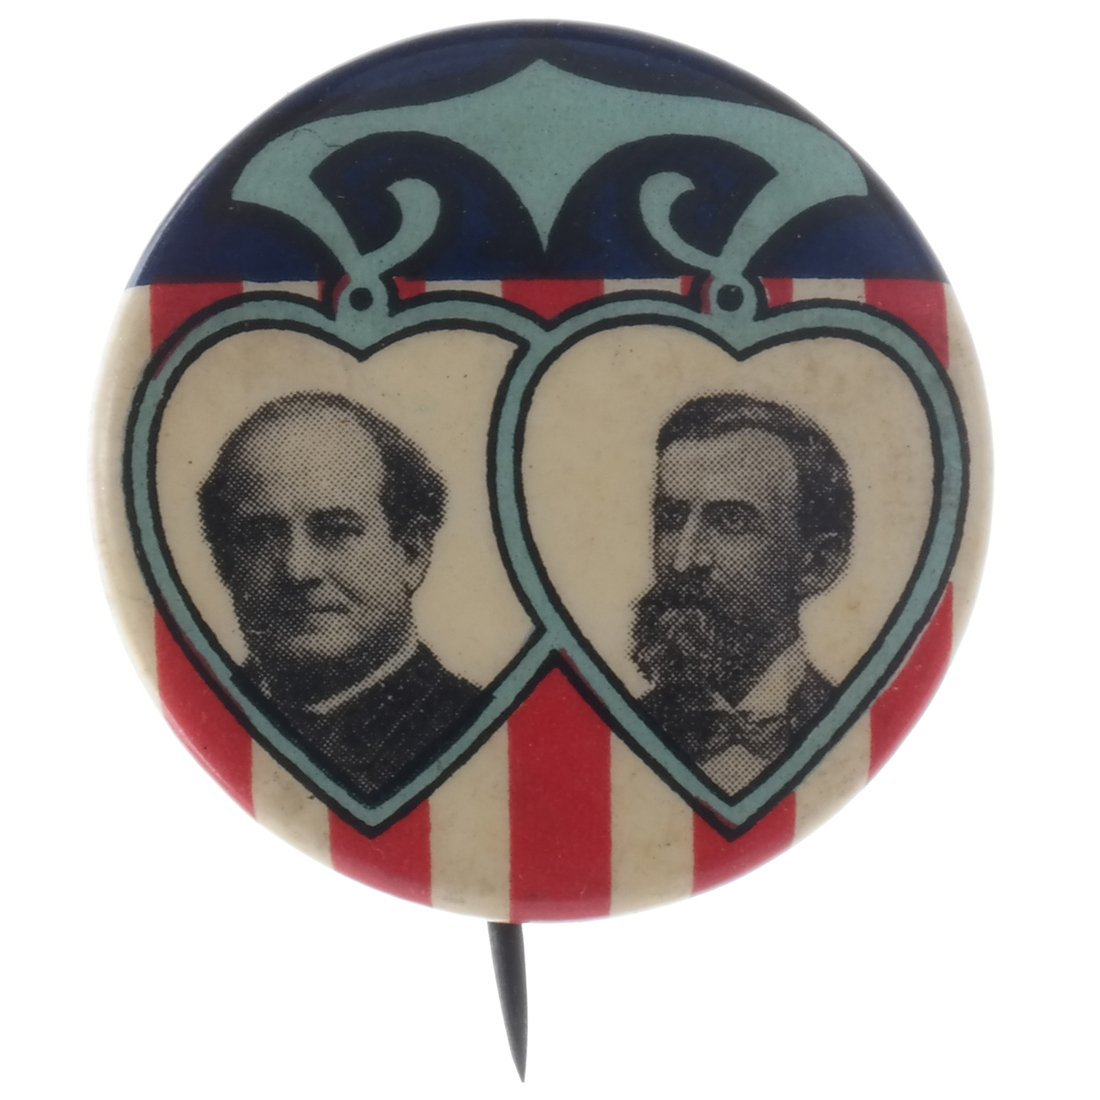 Bryan & Kern 1908 Jugate Celluloid Pinback